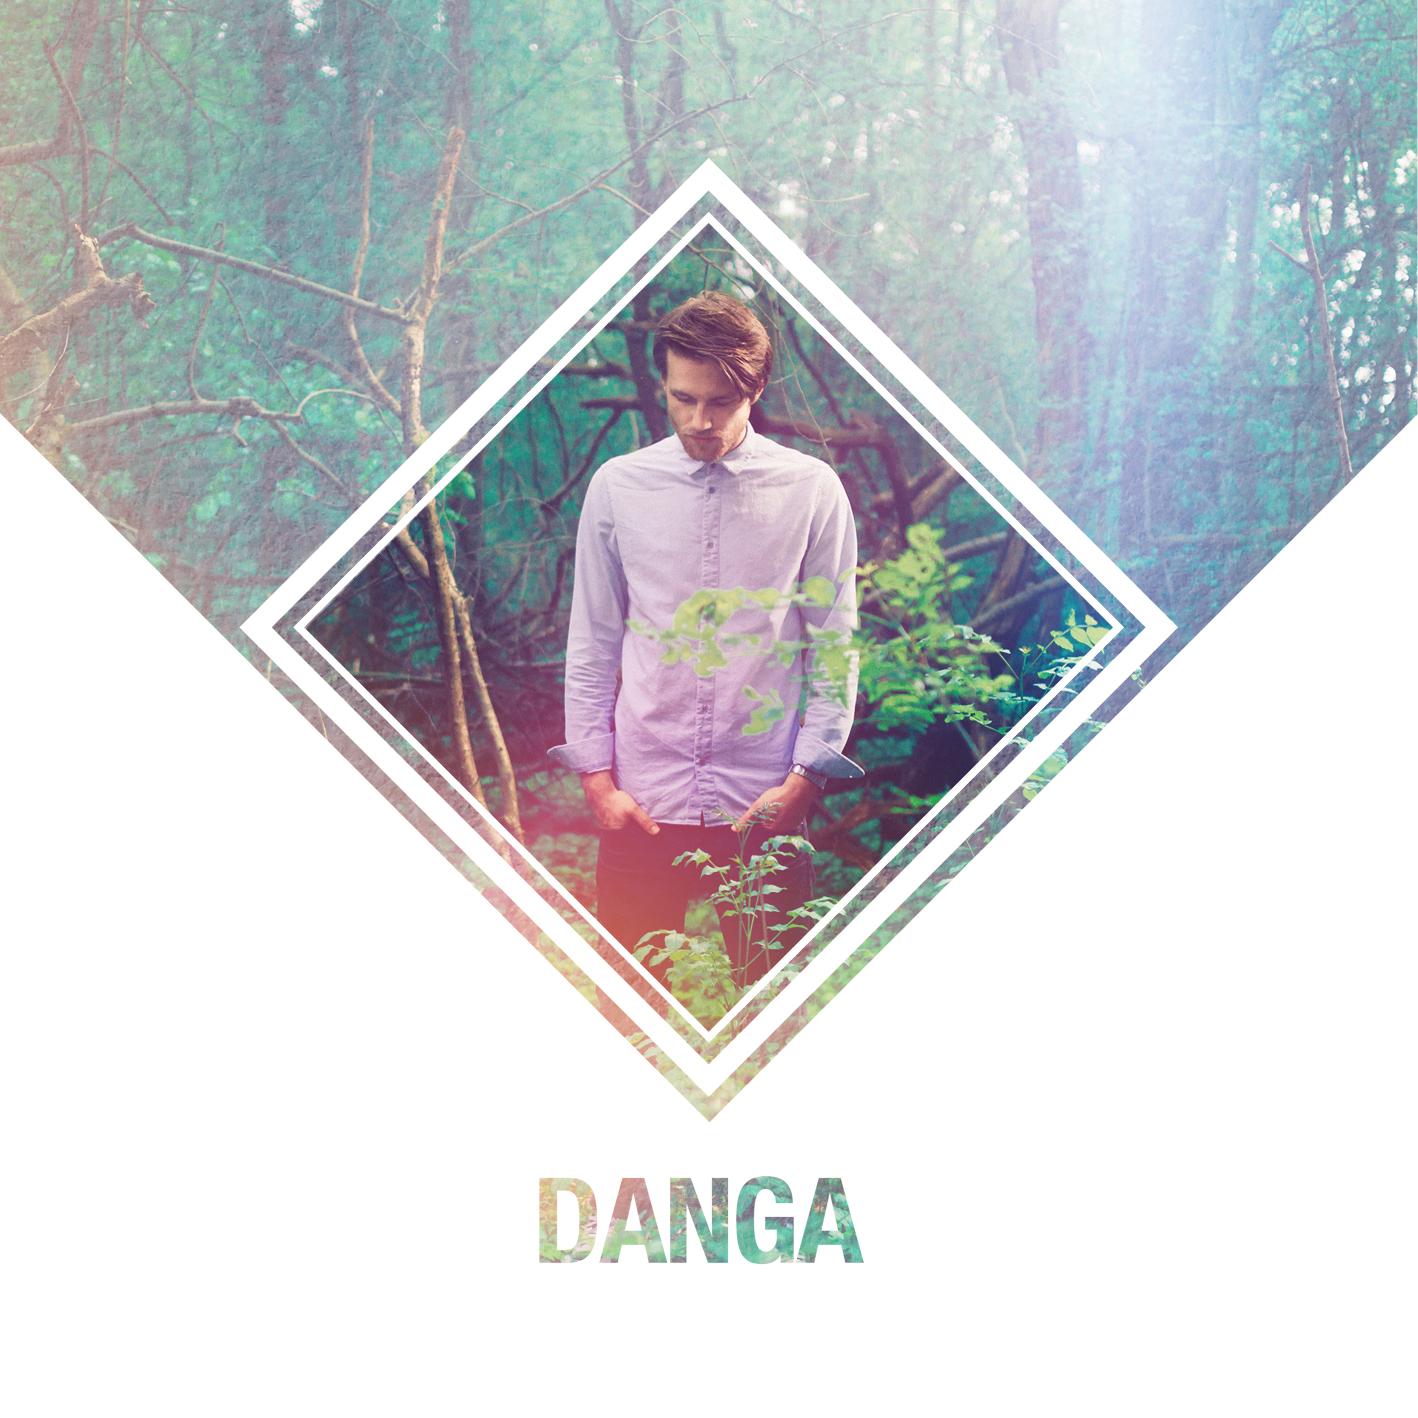 DANGA Paul Rossaint - Photography/Camera